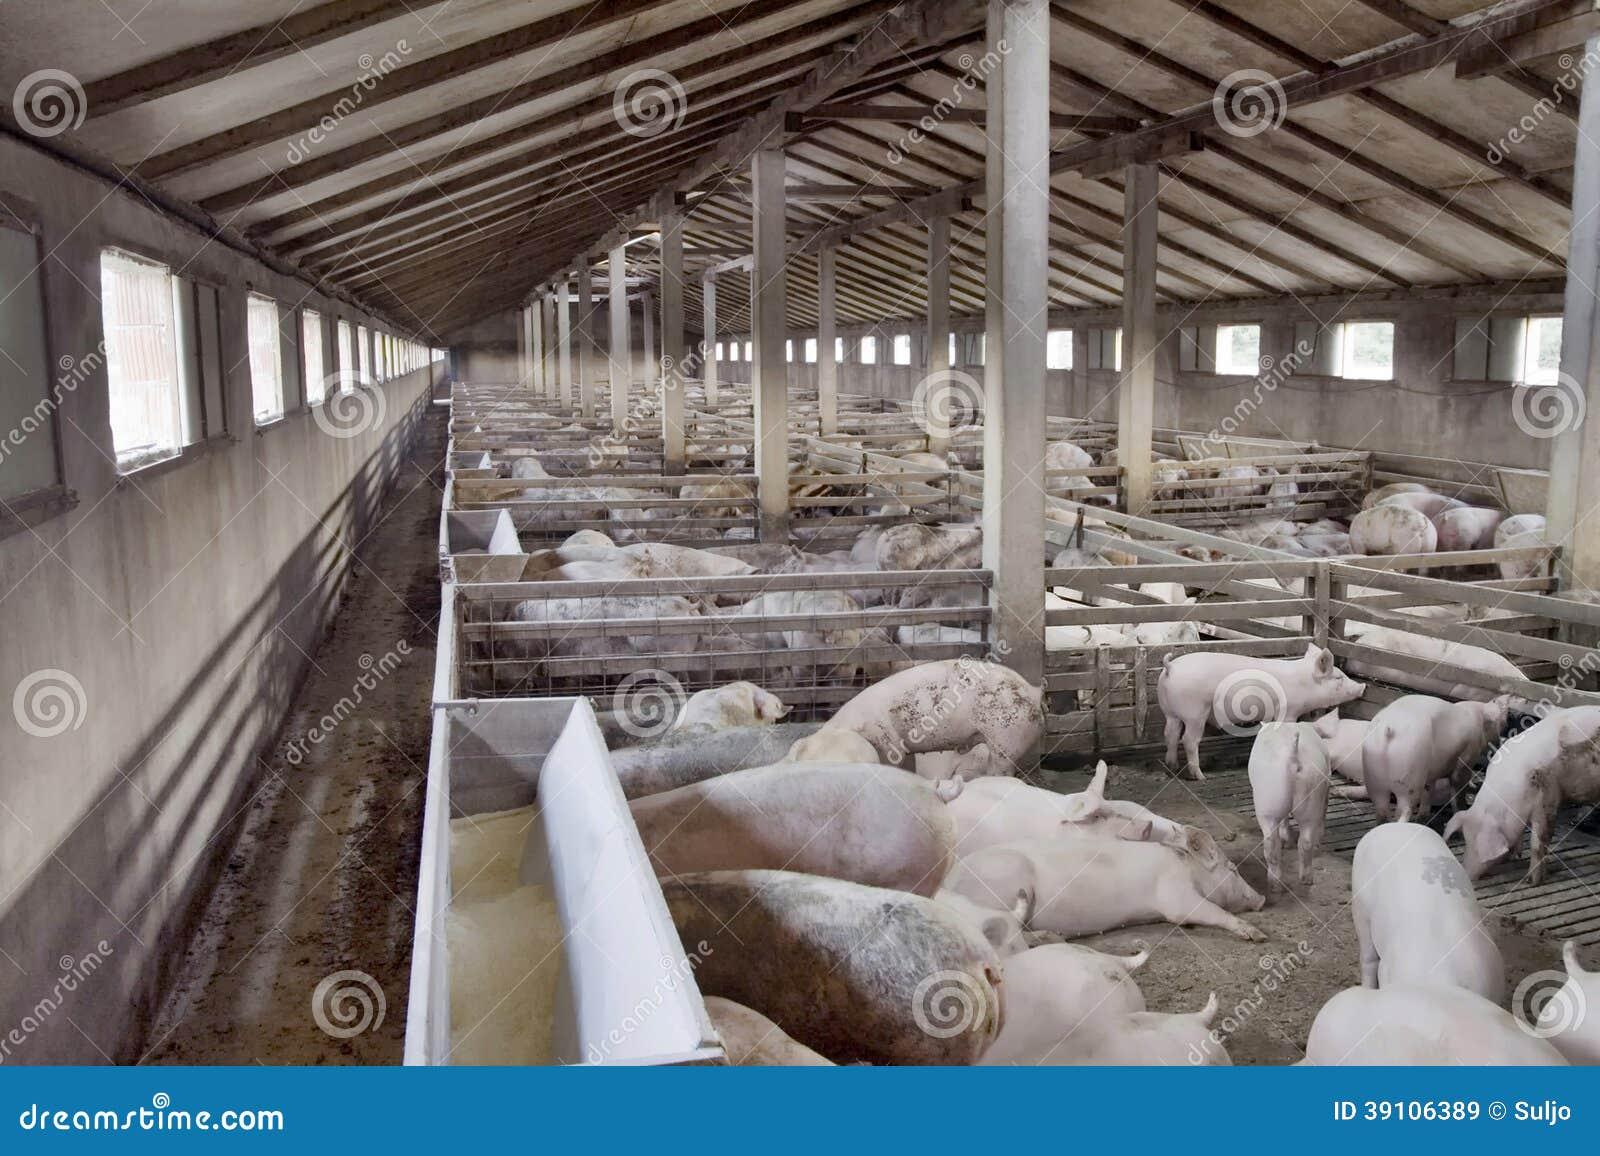 hog farm business plan